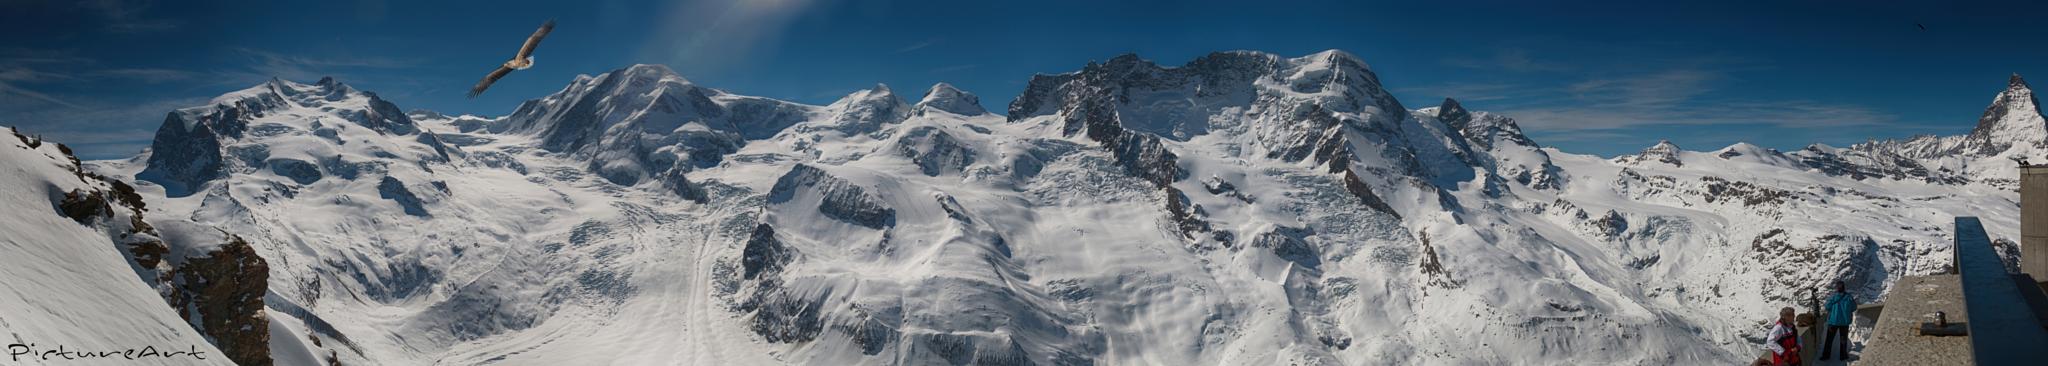 3100 Meter Gornergrat , Zermatt, Switzerland by PictureArt by Steven Schiller